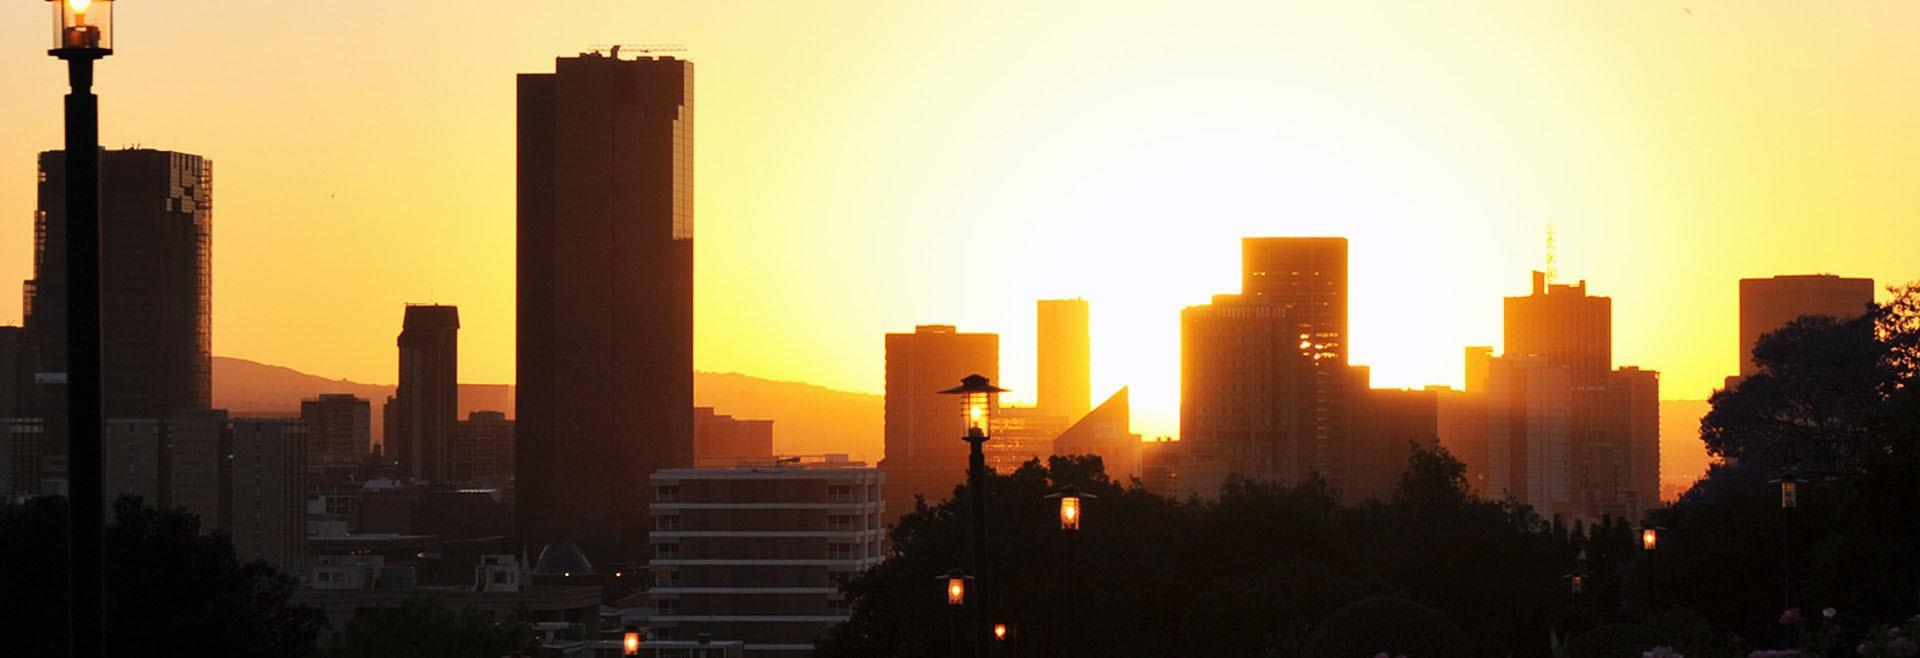 City Of Tshwane: City Planning And Development